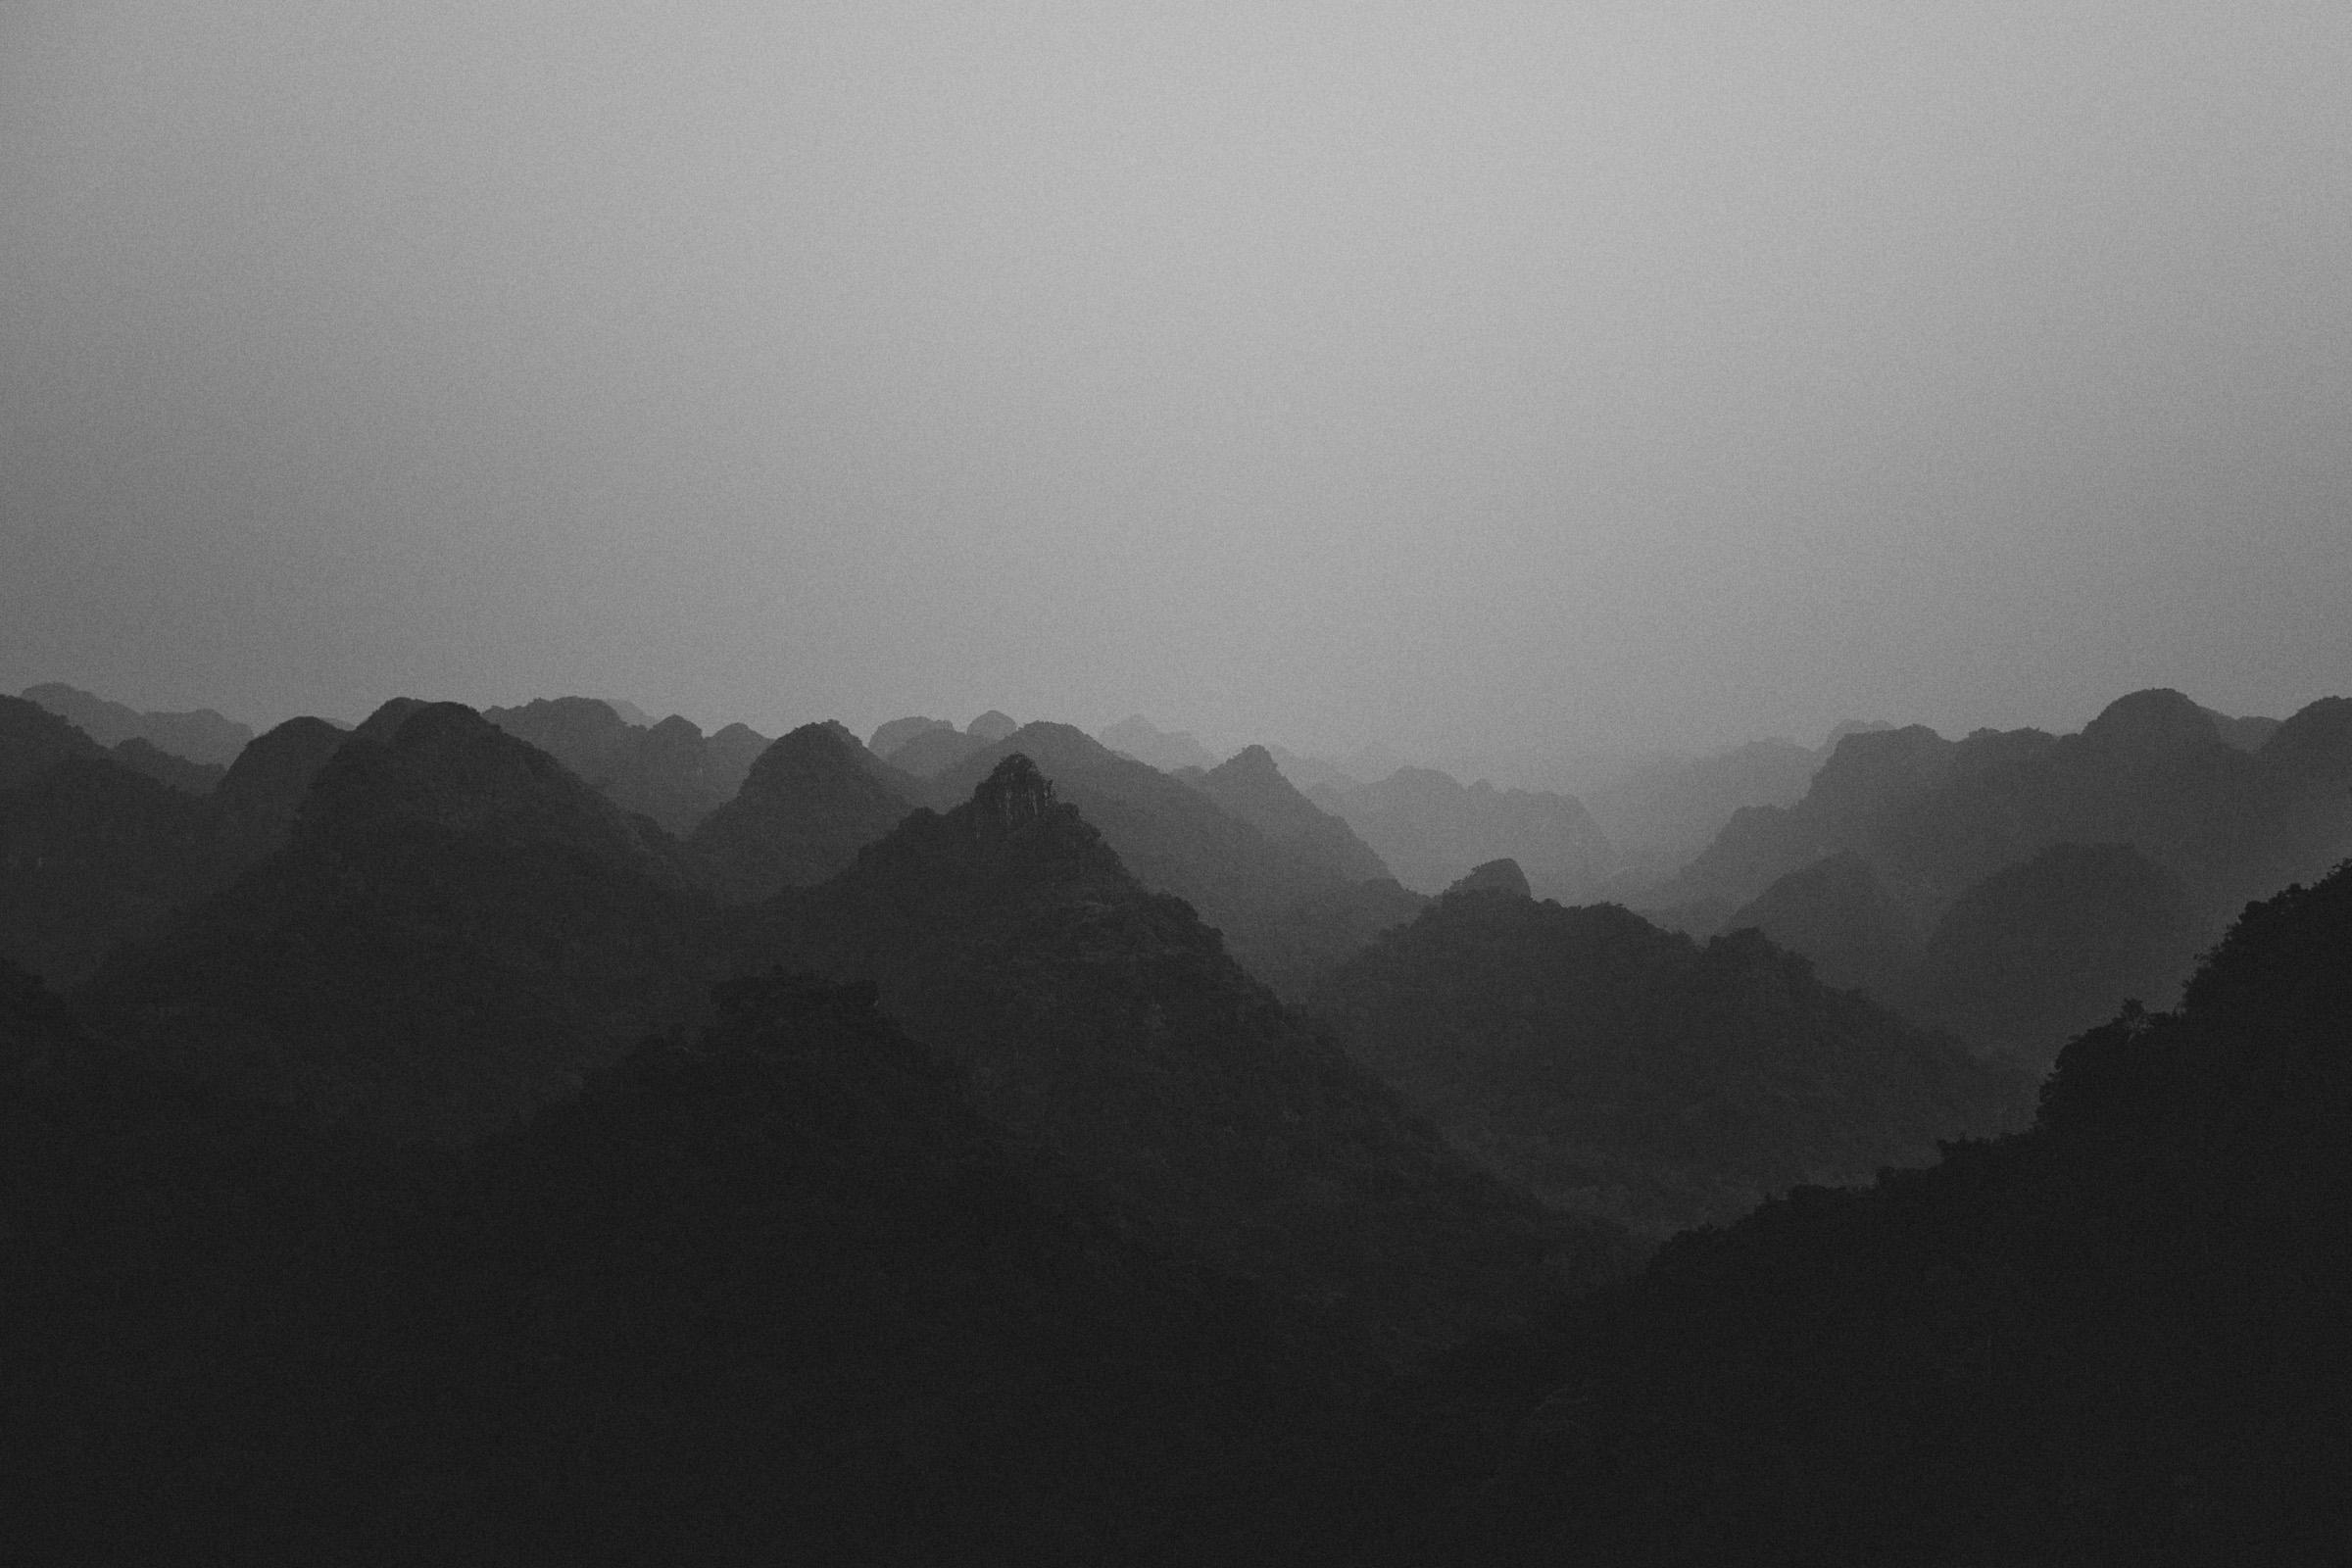 Mountain range | Katch Silva